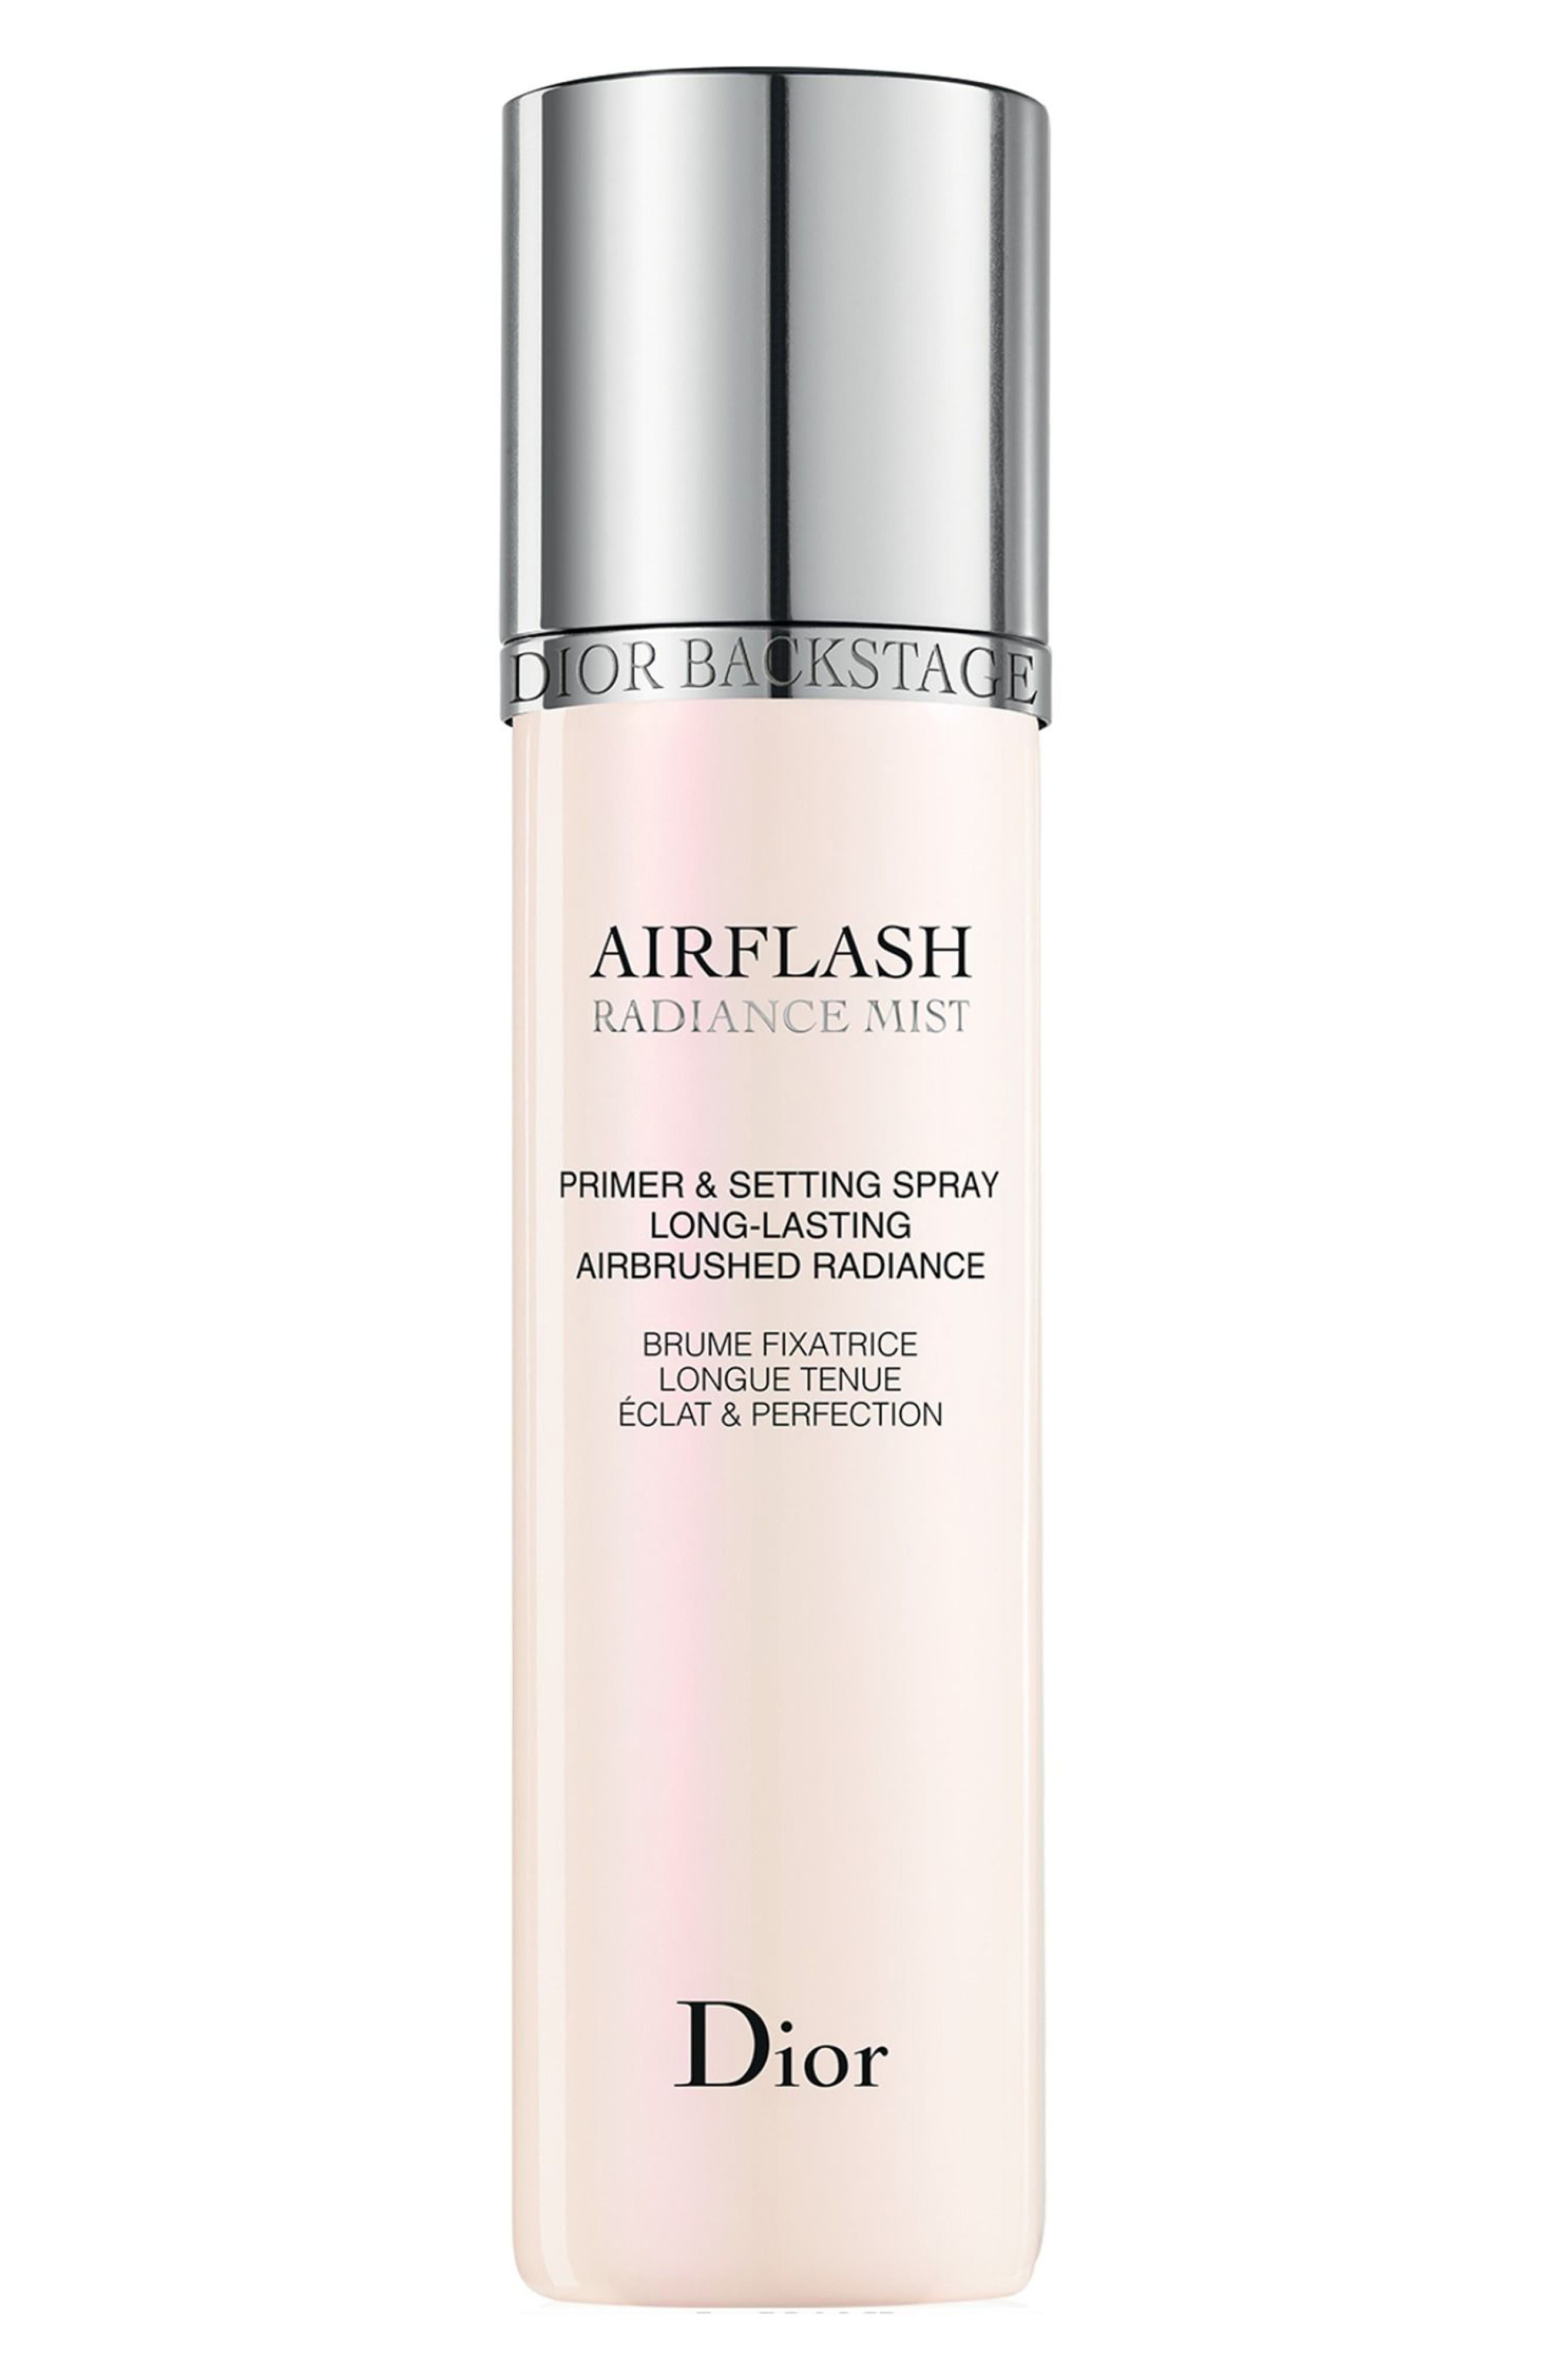 Dior Backstage Airflash Radiance Mist Primer & Setting Spray - 001 Radiance